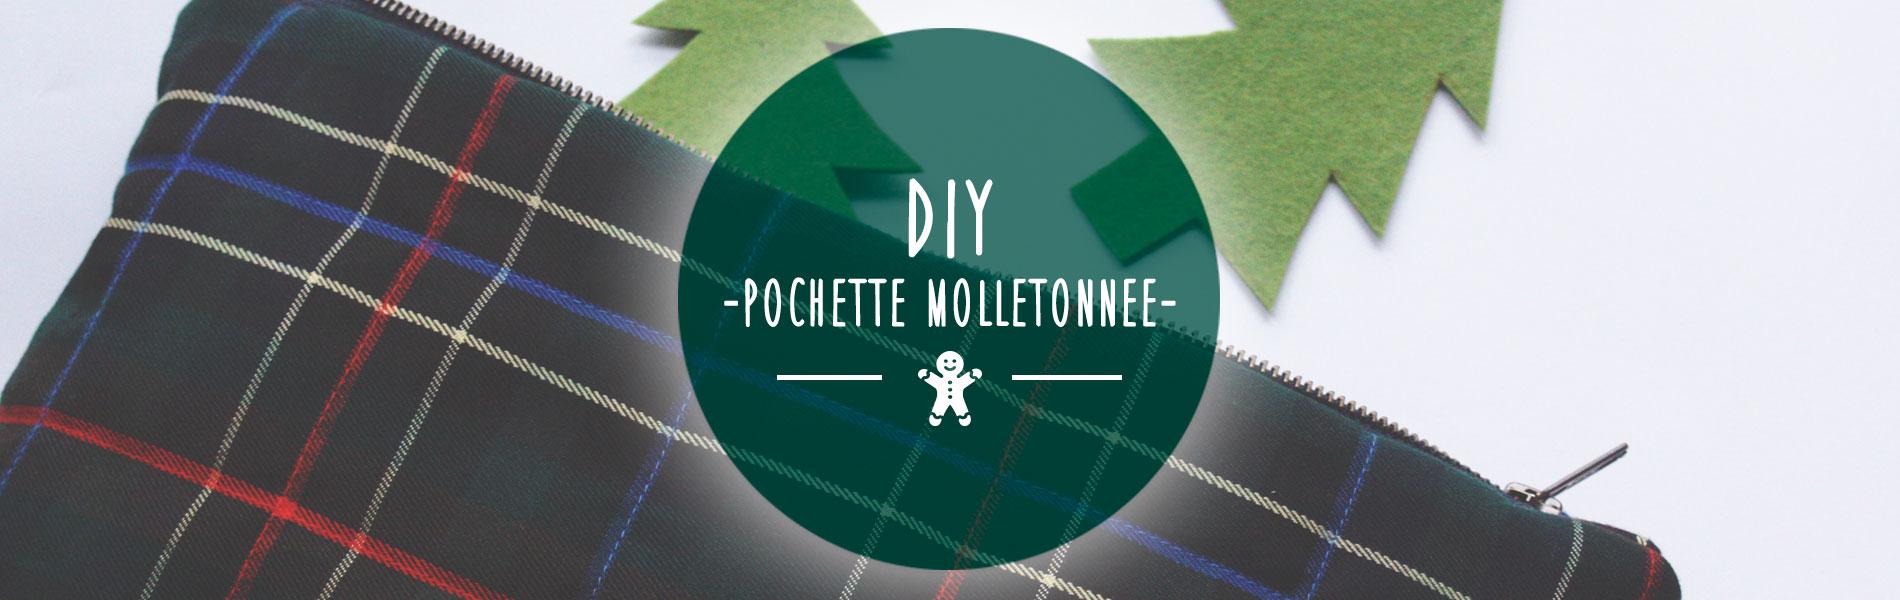 DIY Pochette molletonnée